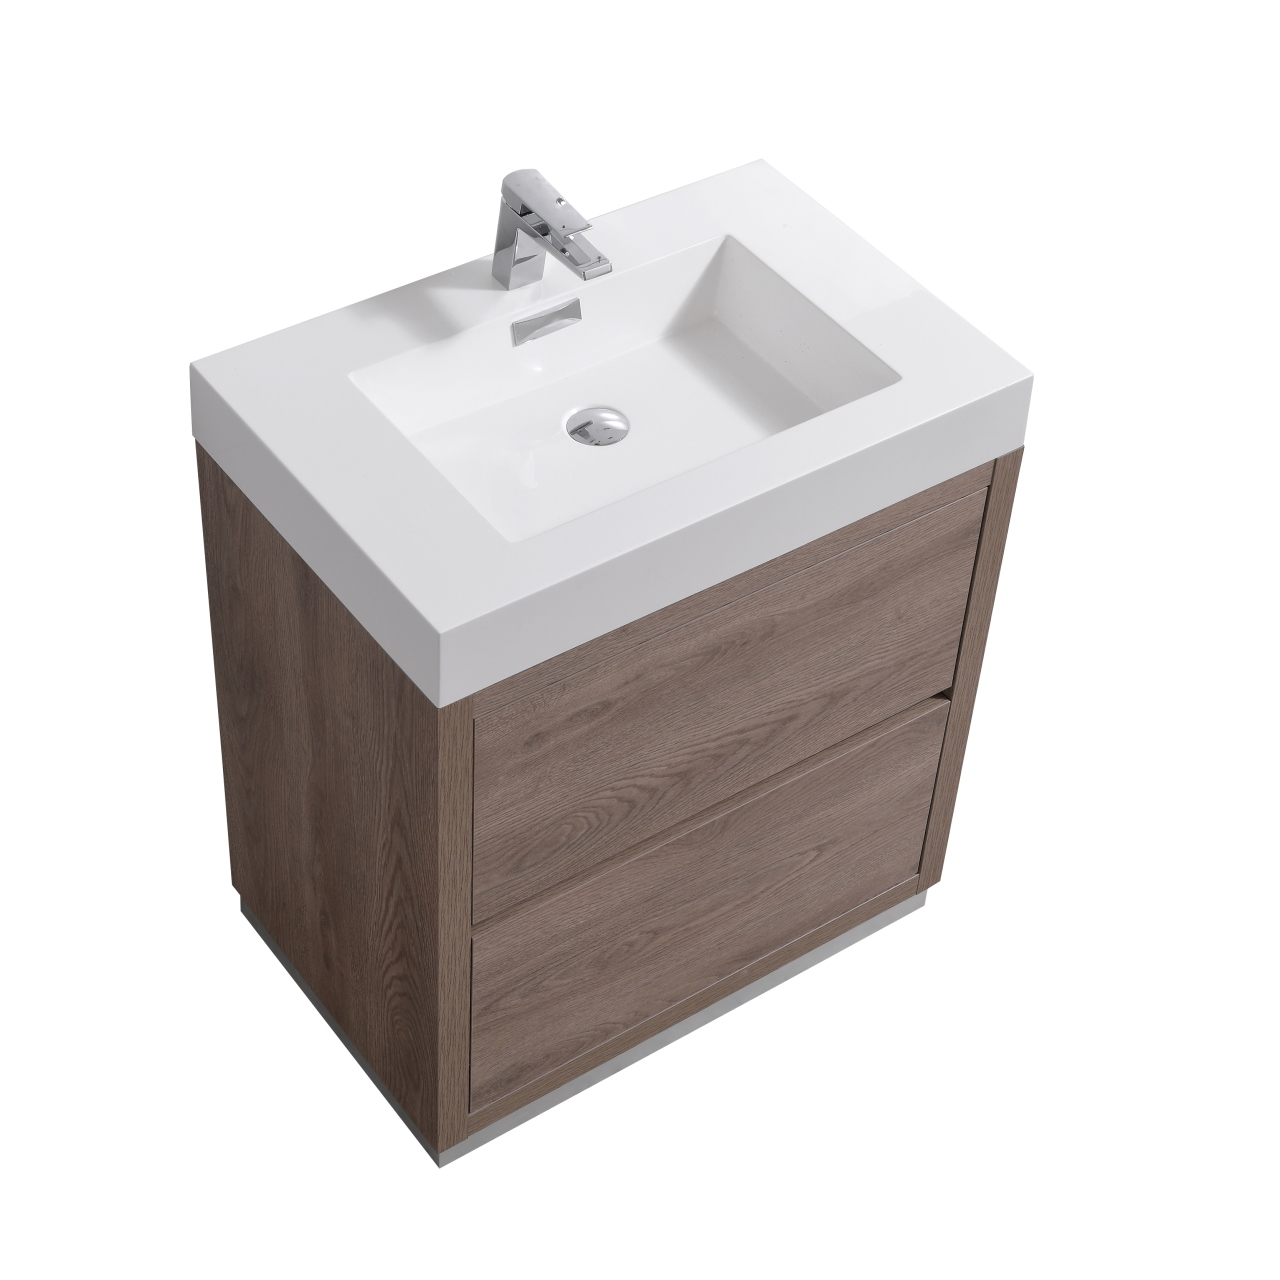 "Modern Lux 30"" Butternut  Free Standing Modern Bathroom Vanity"